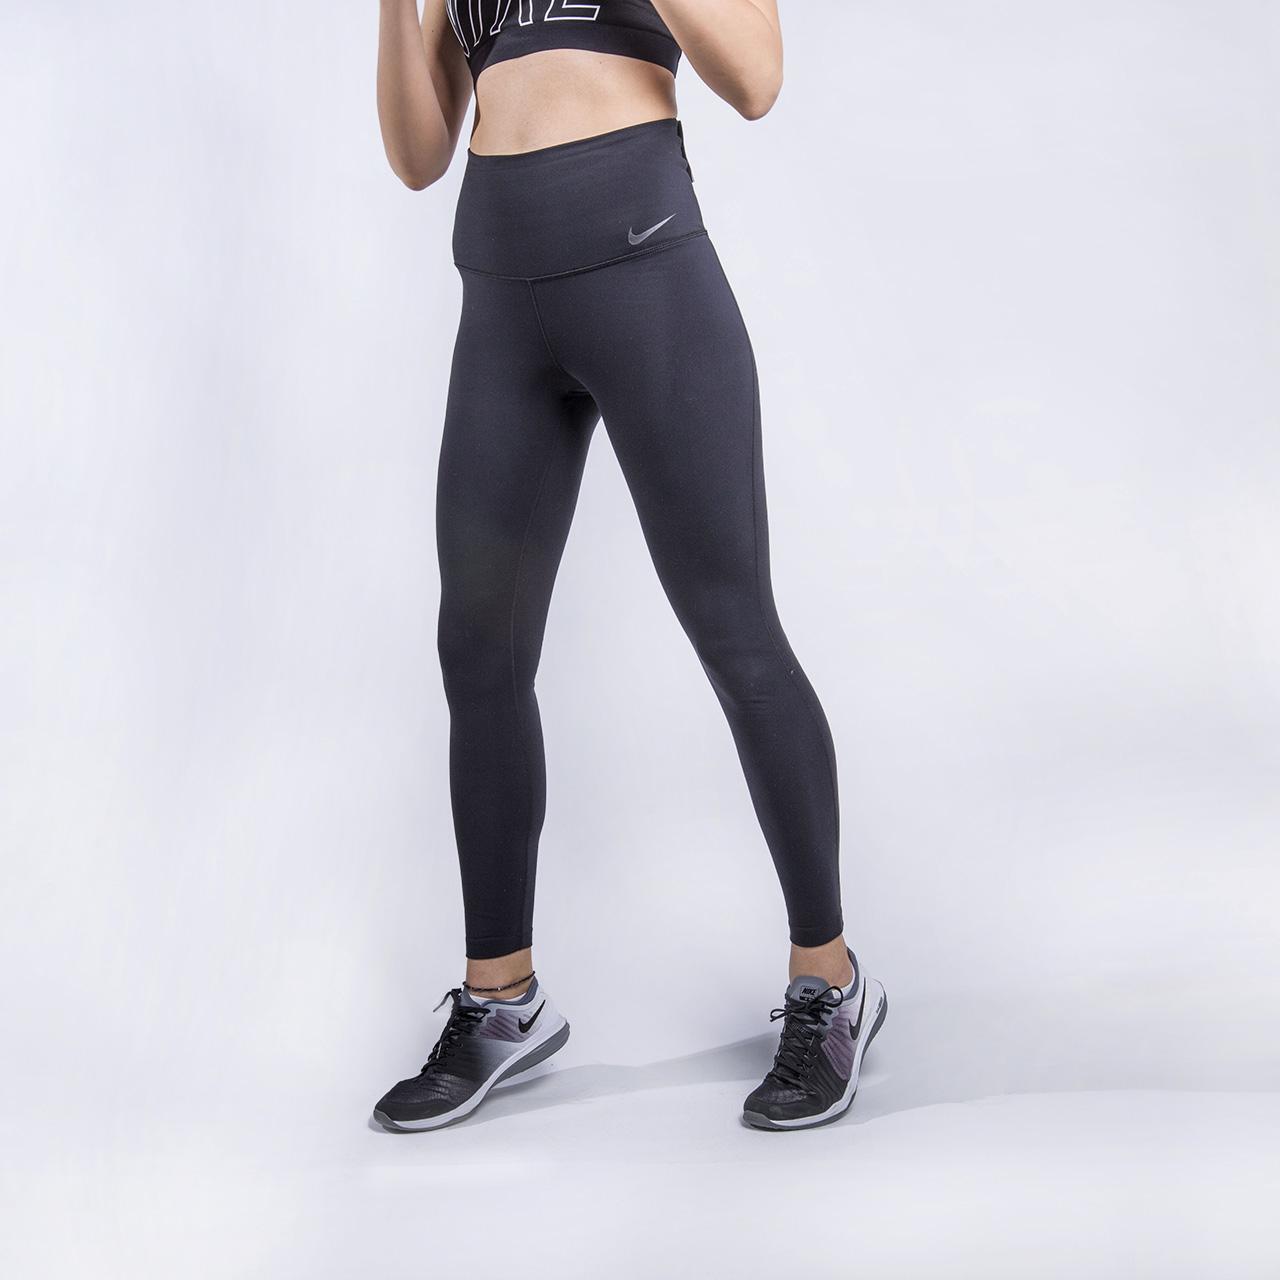 Тайтсы для тренинга Nike NK PWR TGHT Hi RiseБрюки и джинсы<br>80% нейлон, 20% эластан<br><br>Цвет: Черный<br>Размеры US: XS<br>Пол: Женский